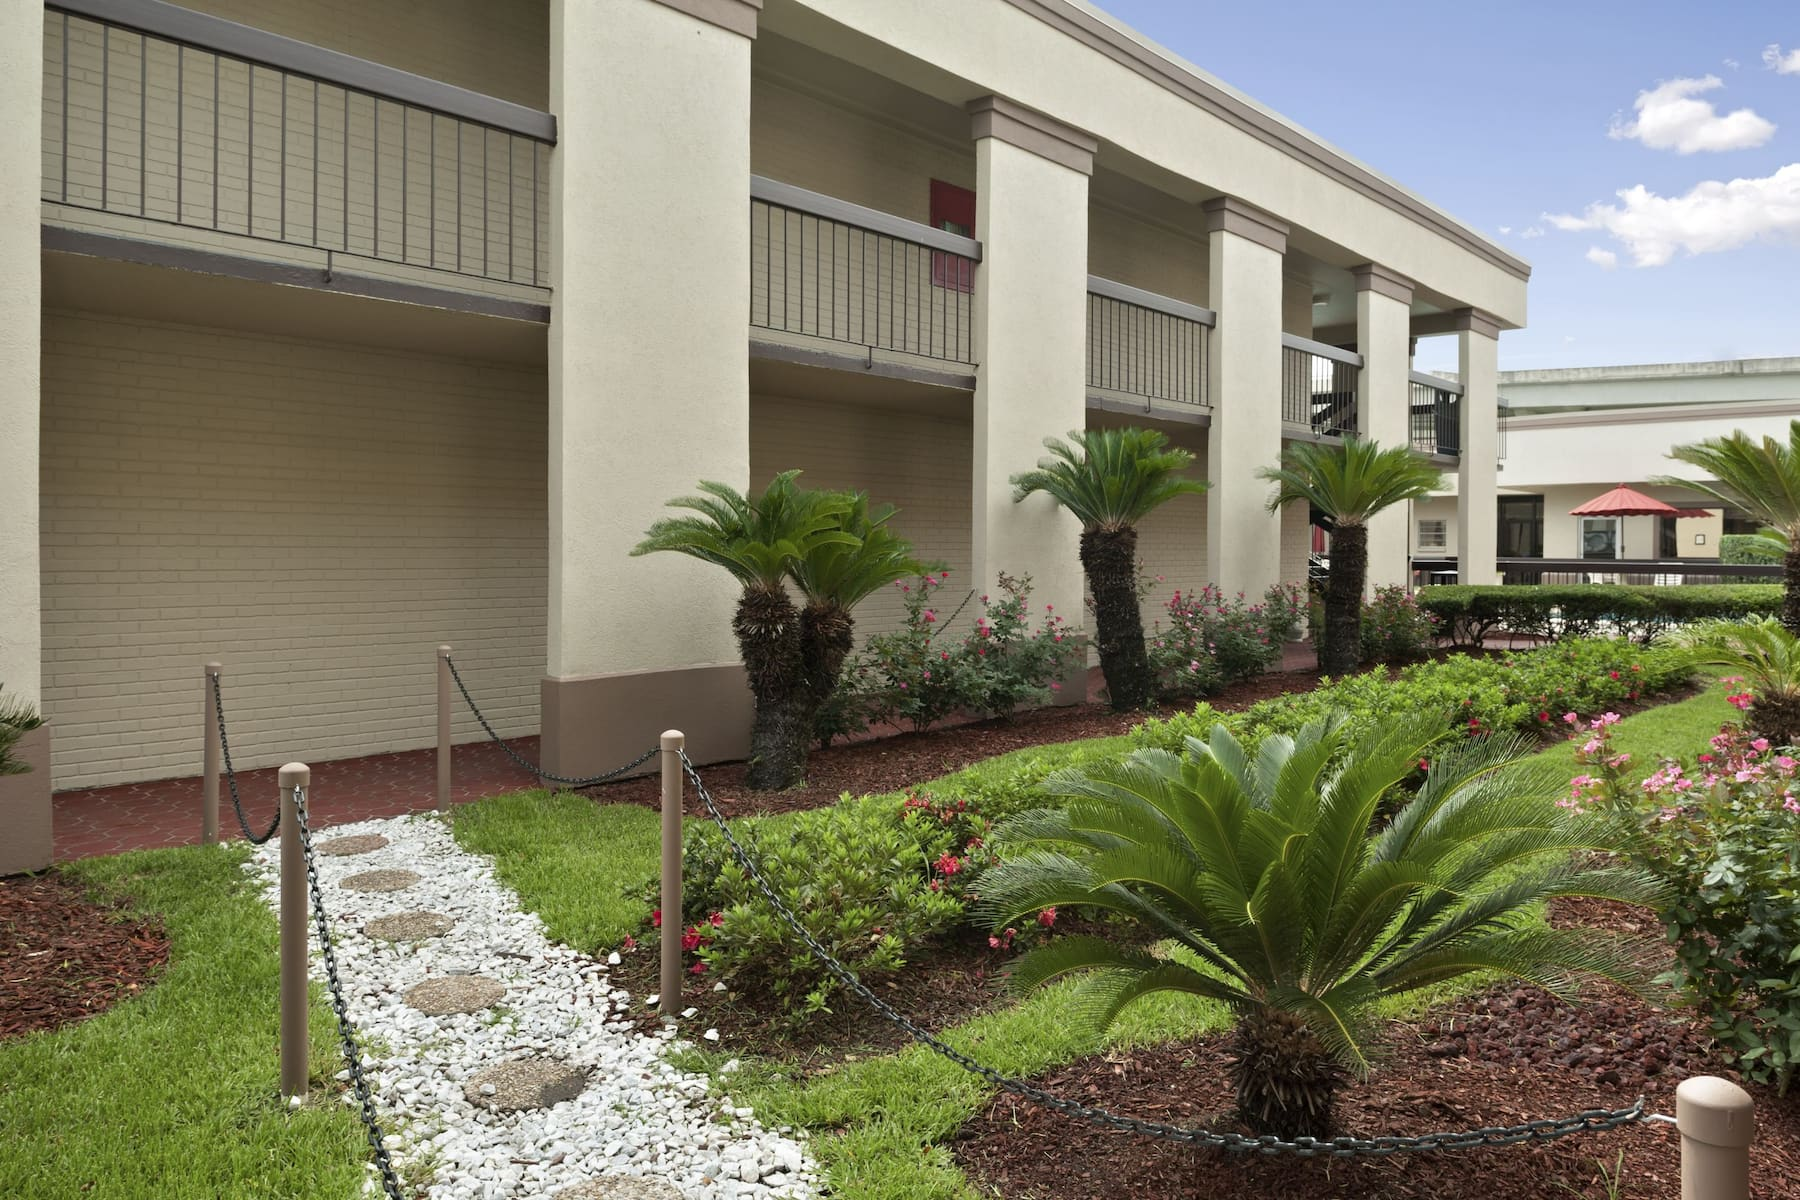 Travelodge By Wyndham New Orleans West Harvey Hotel